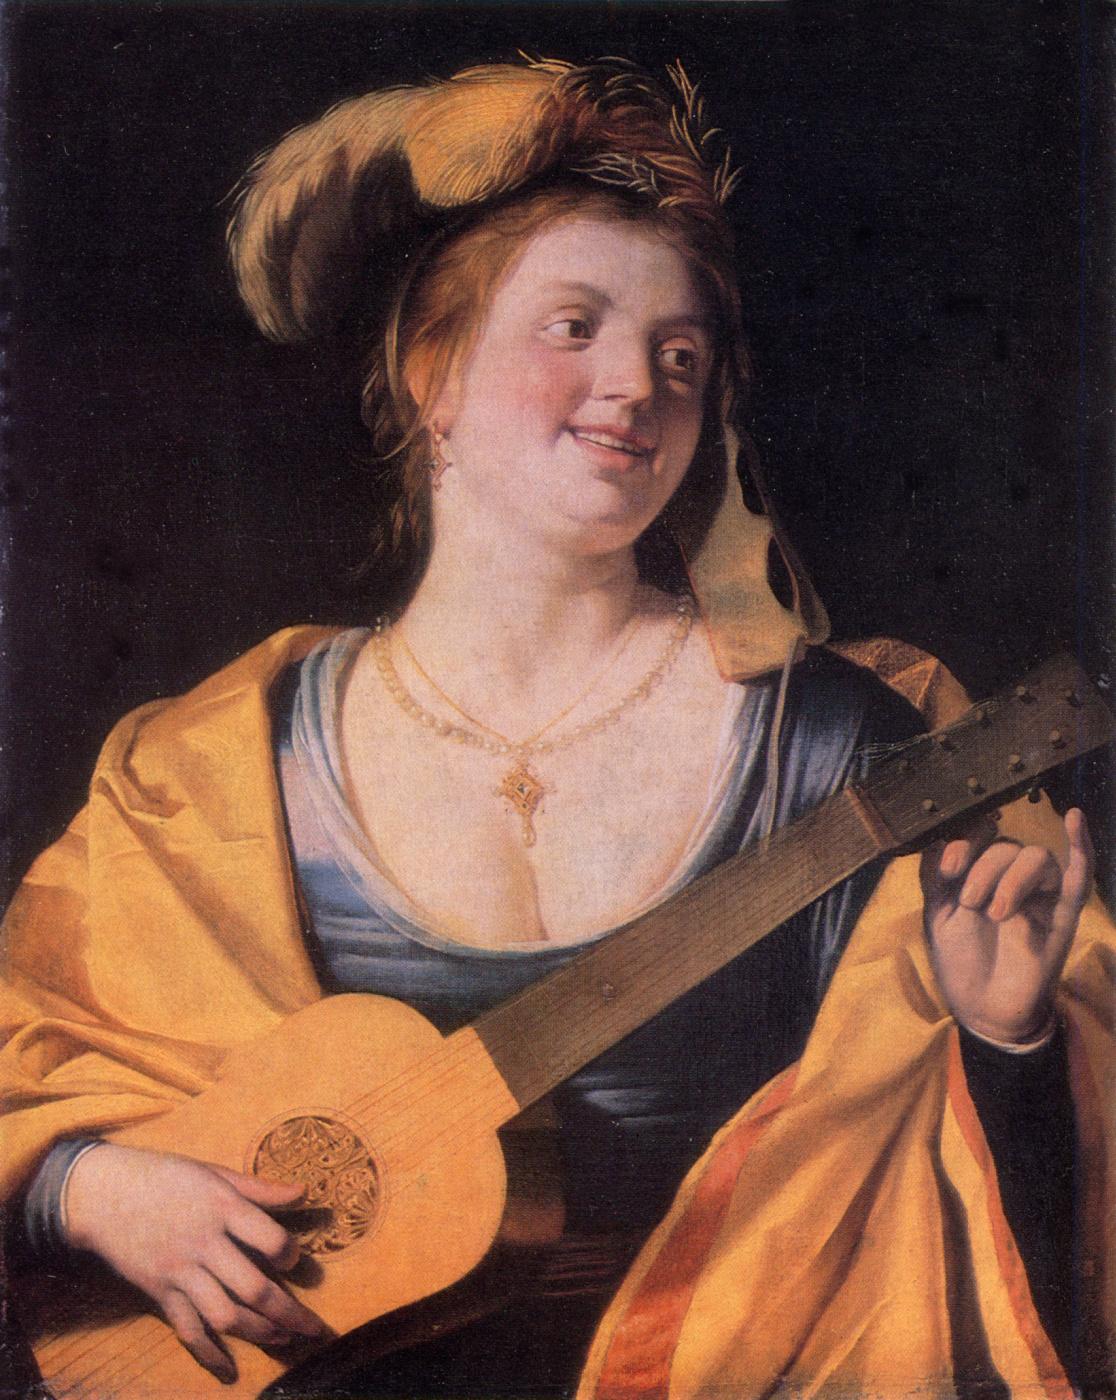 Gerrit van Honthorst. Guitarist